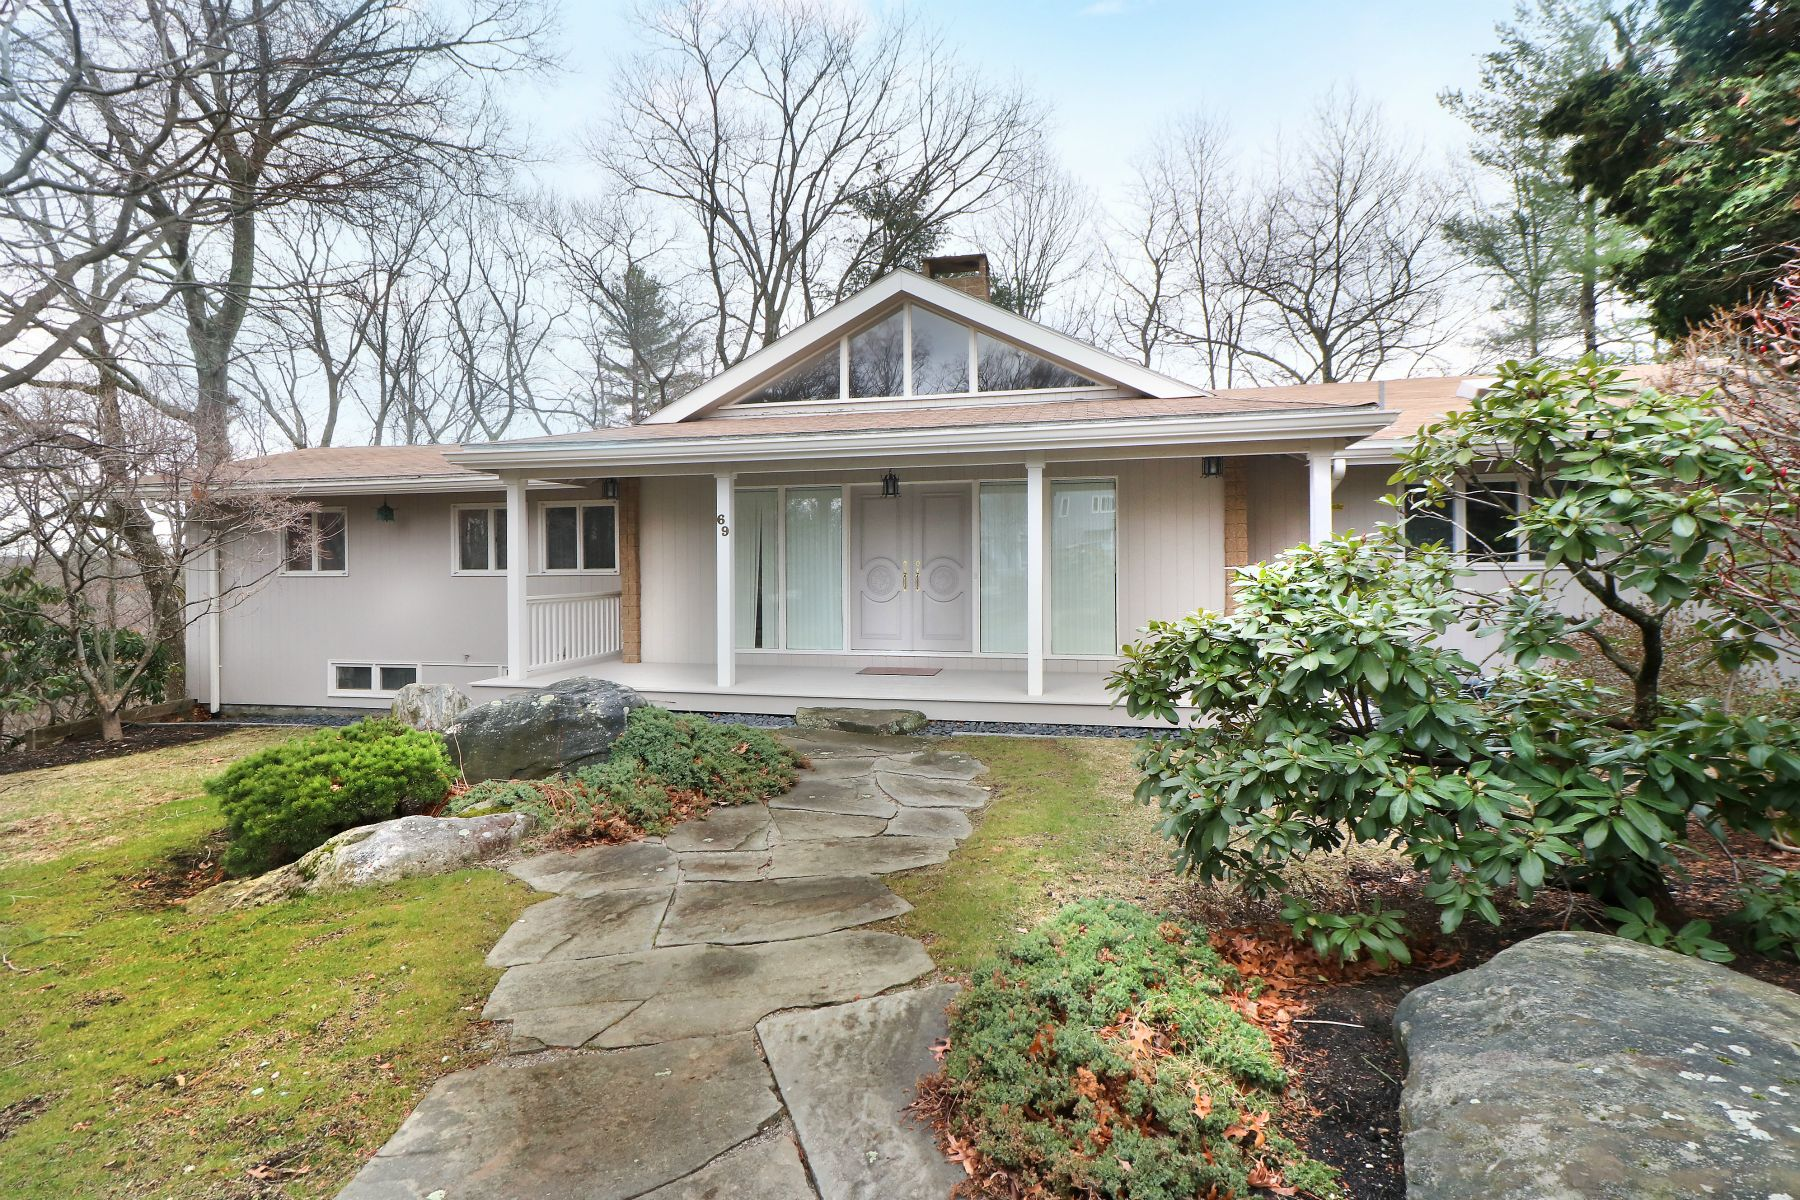 Villa per Vendita alle ore 69 Crestwood Rd, Newton Newton, Massachusetts 02465 Stati Uniti